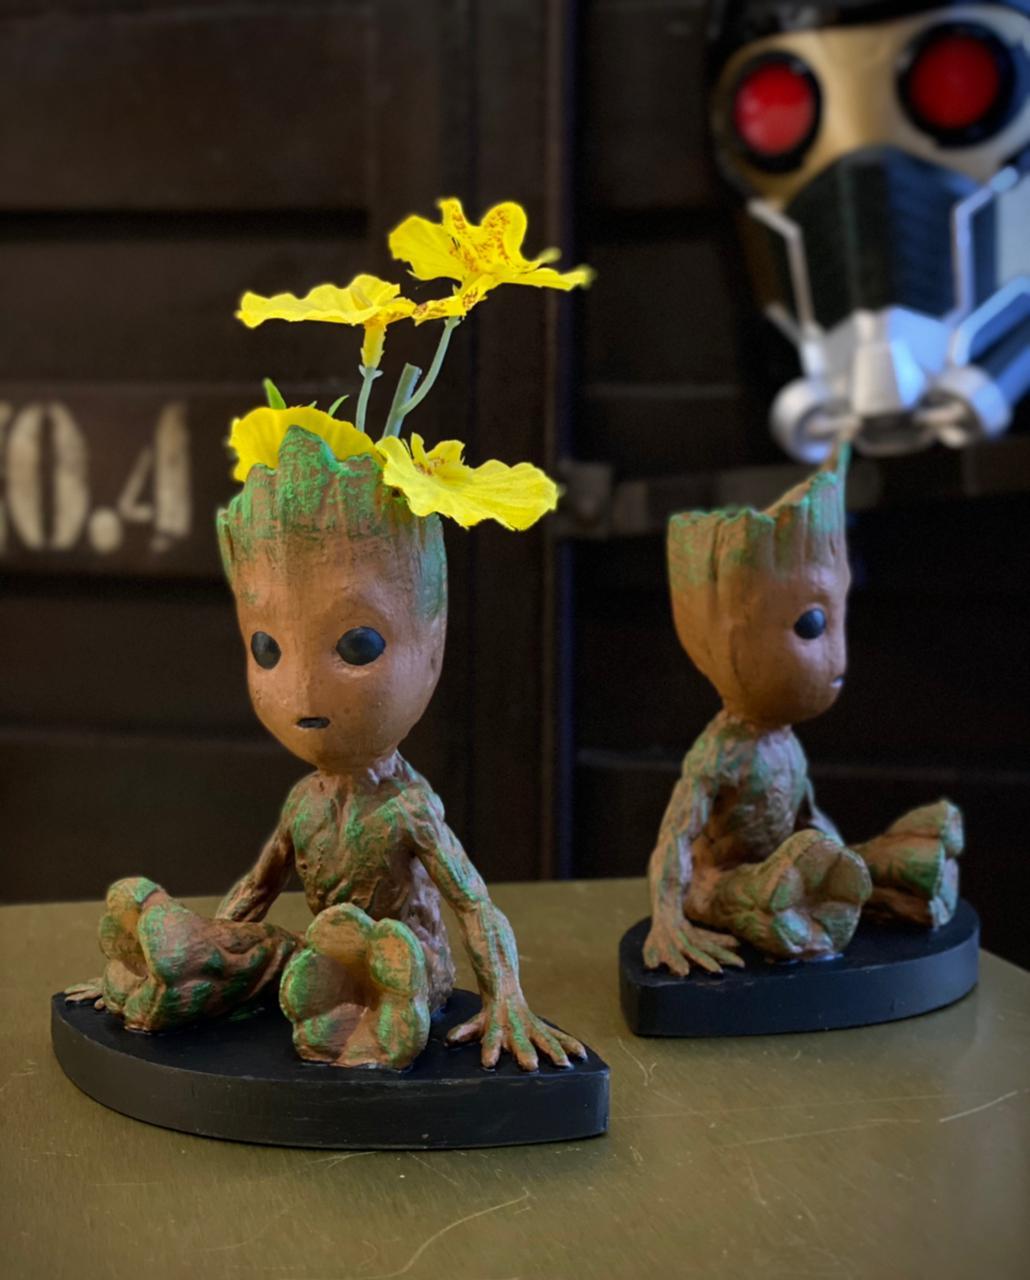 Mini Estátua Decorativa Baby Groot Guardiões da Galáxia Guardians Of The Galaxy Marvel Comics  - EV